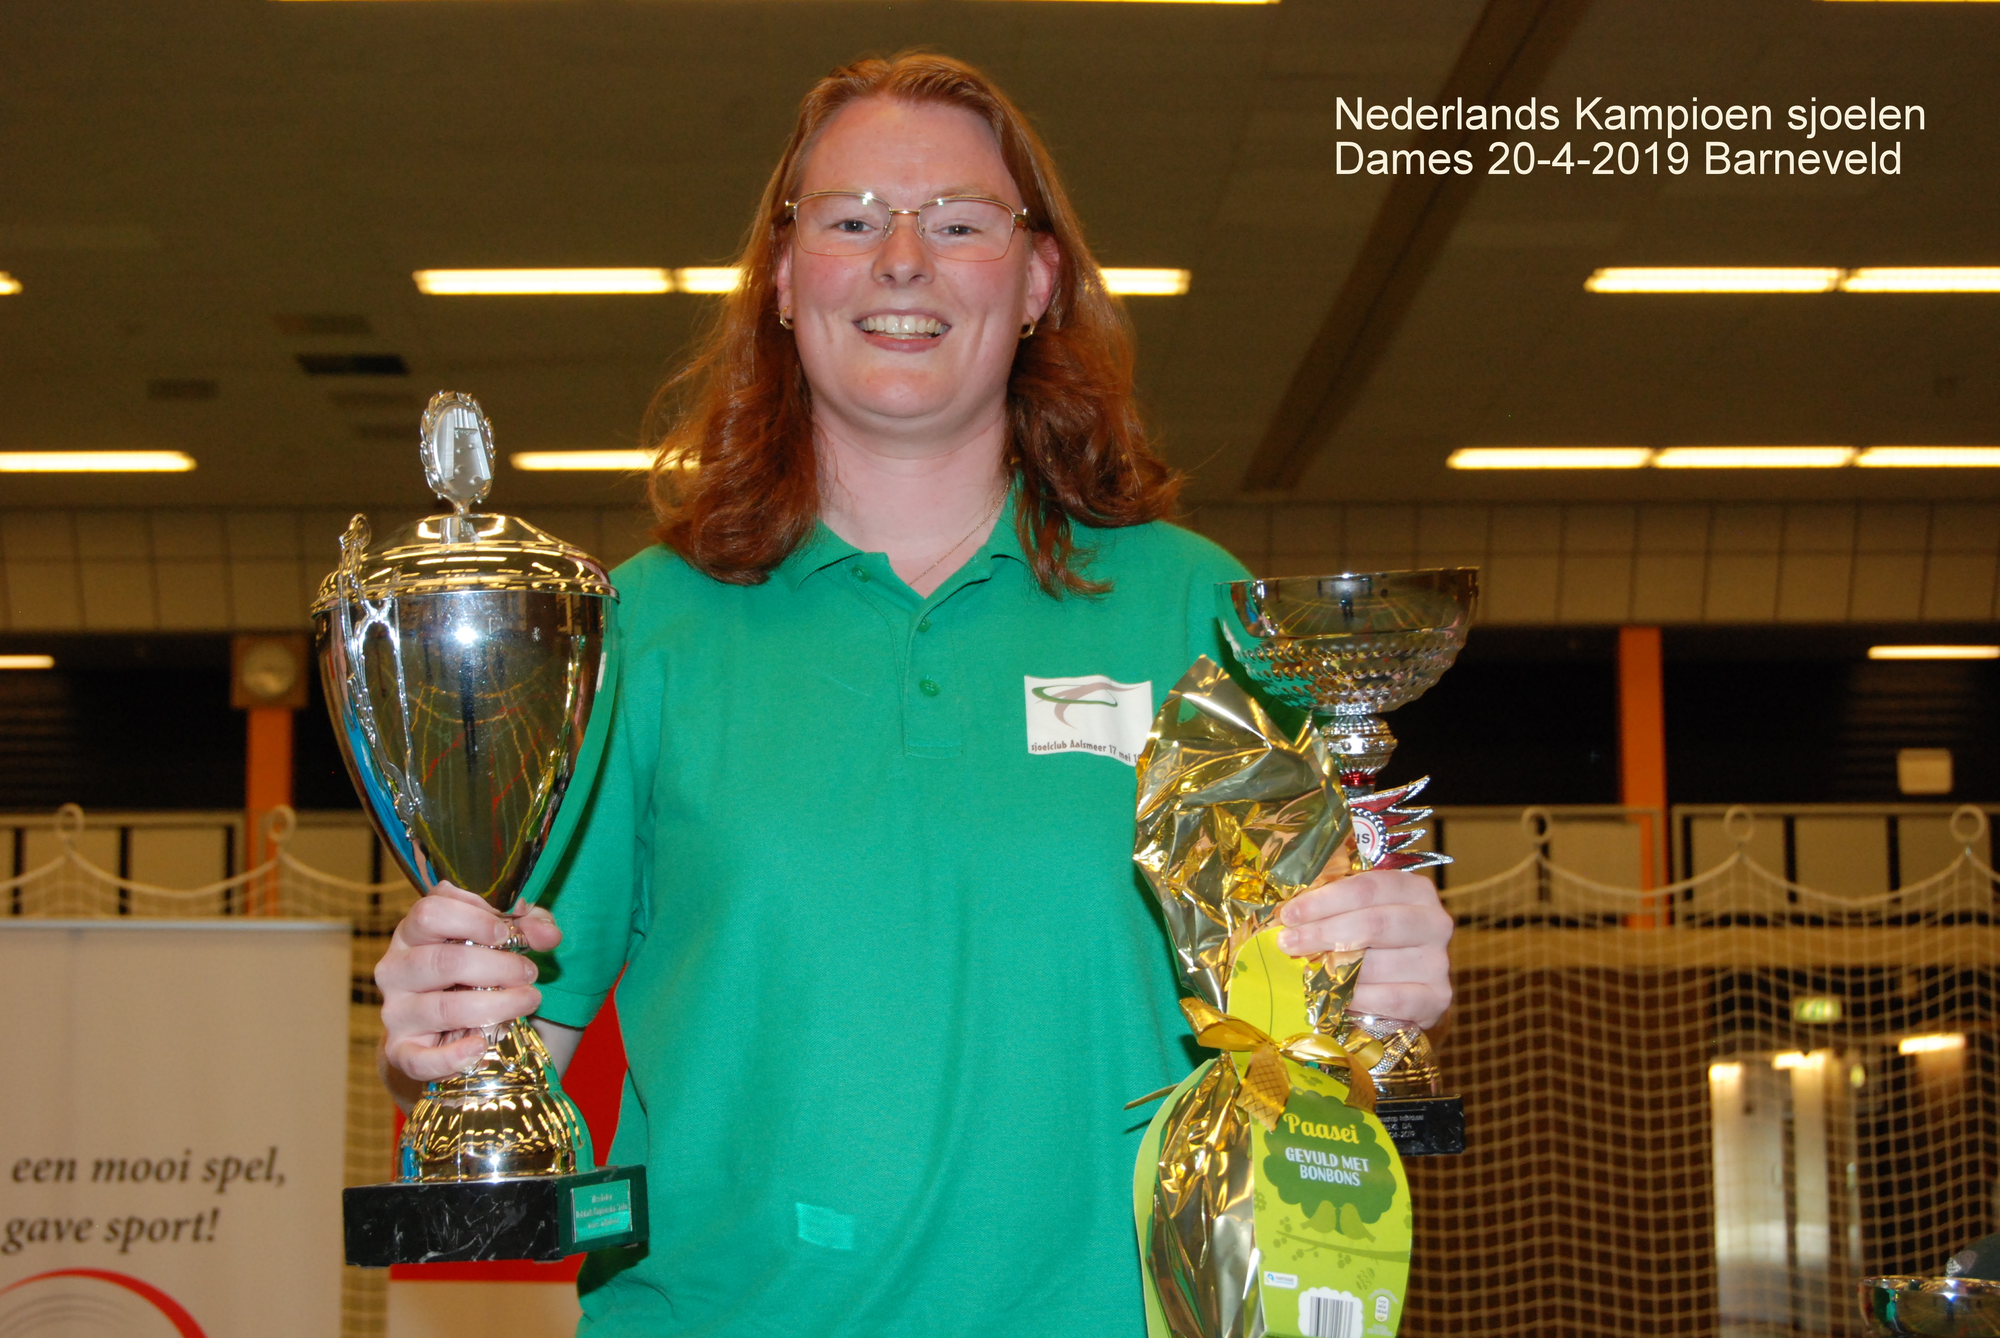 1. Nederlands Kampioen sjoelen Dames 2019